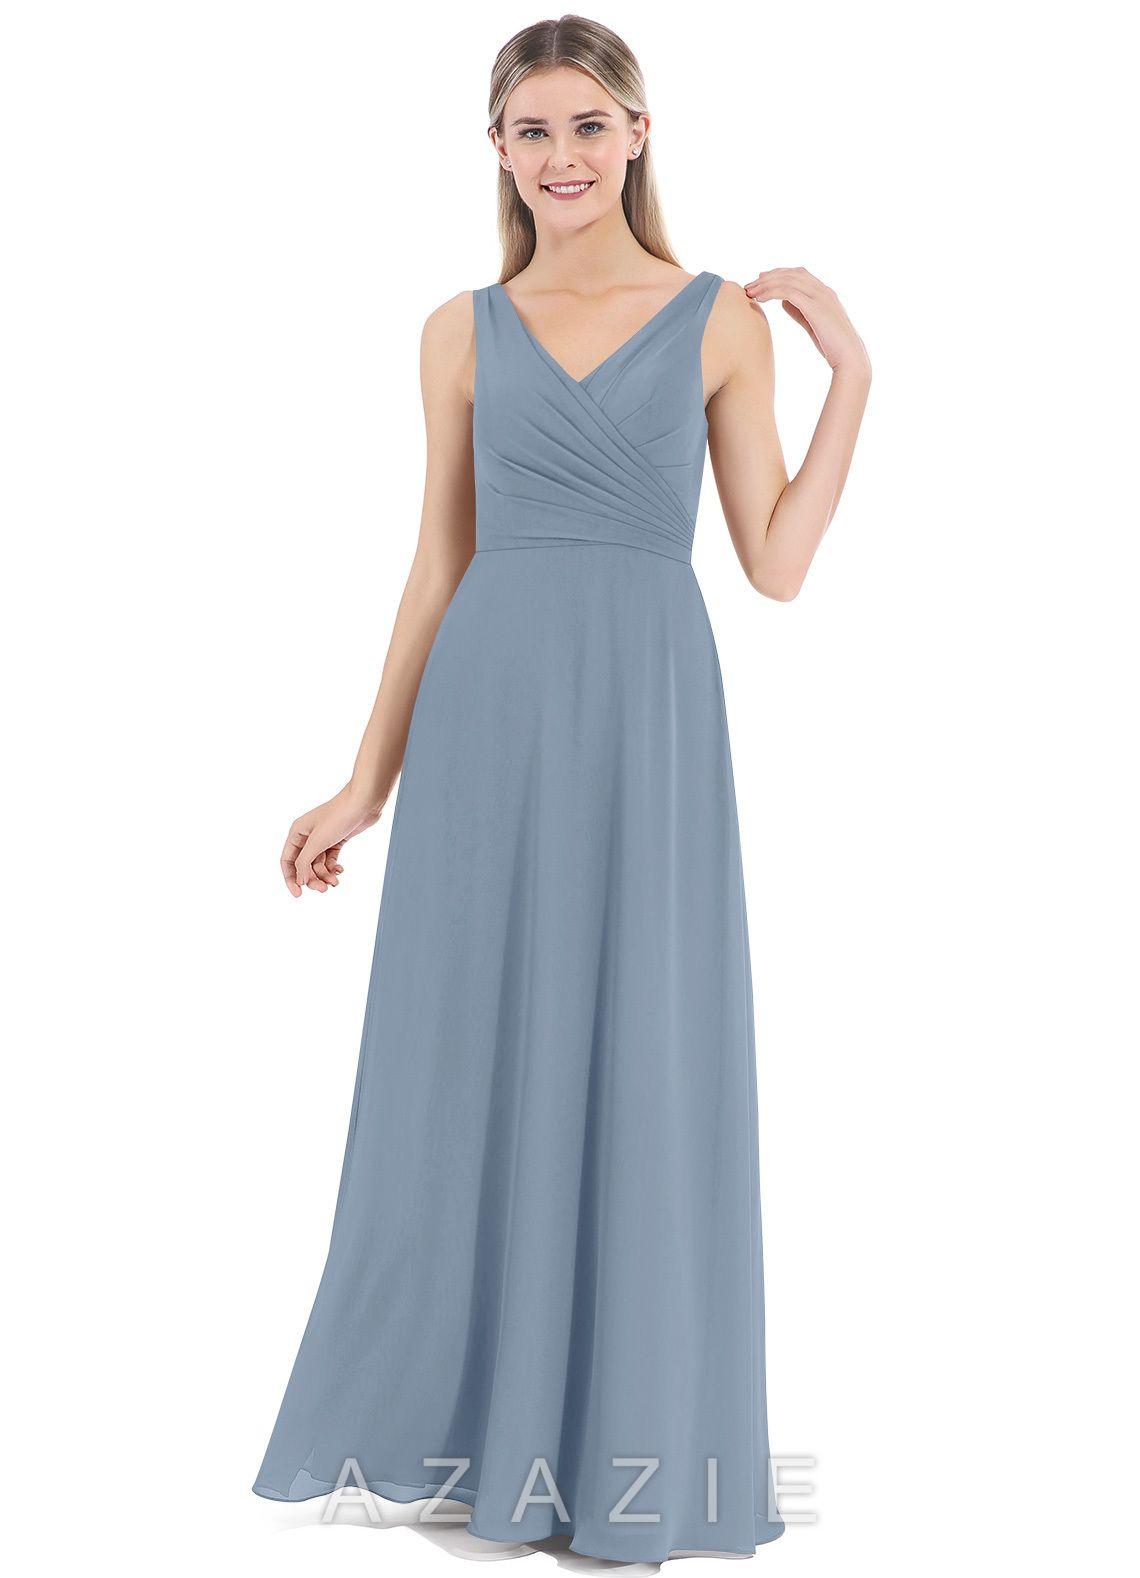 82990847f37 Azazie Nala Bridesmaid Dress - Dusty Blue